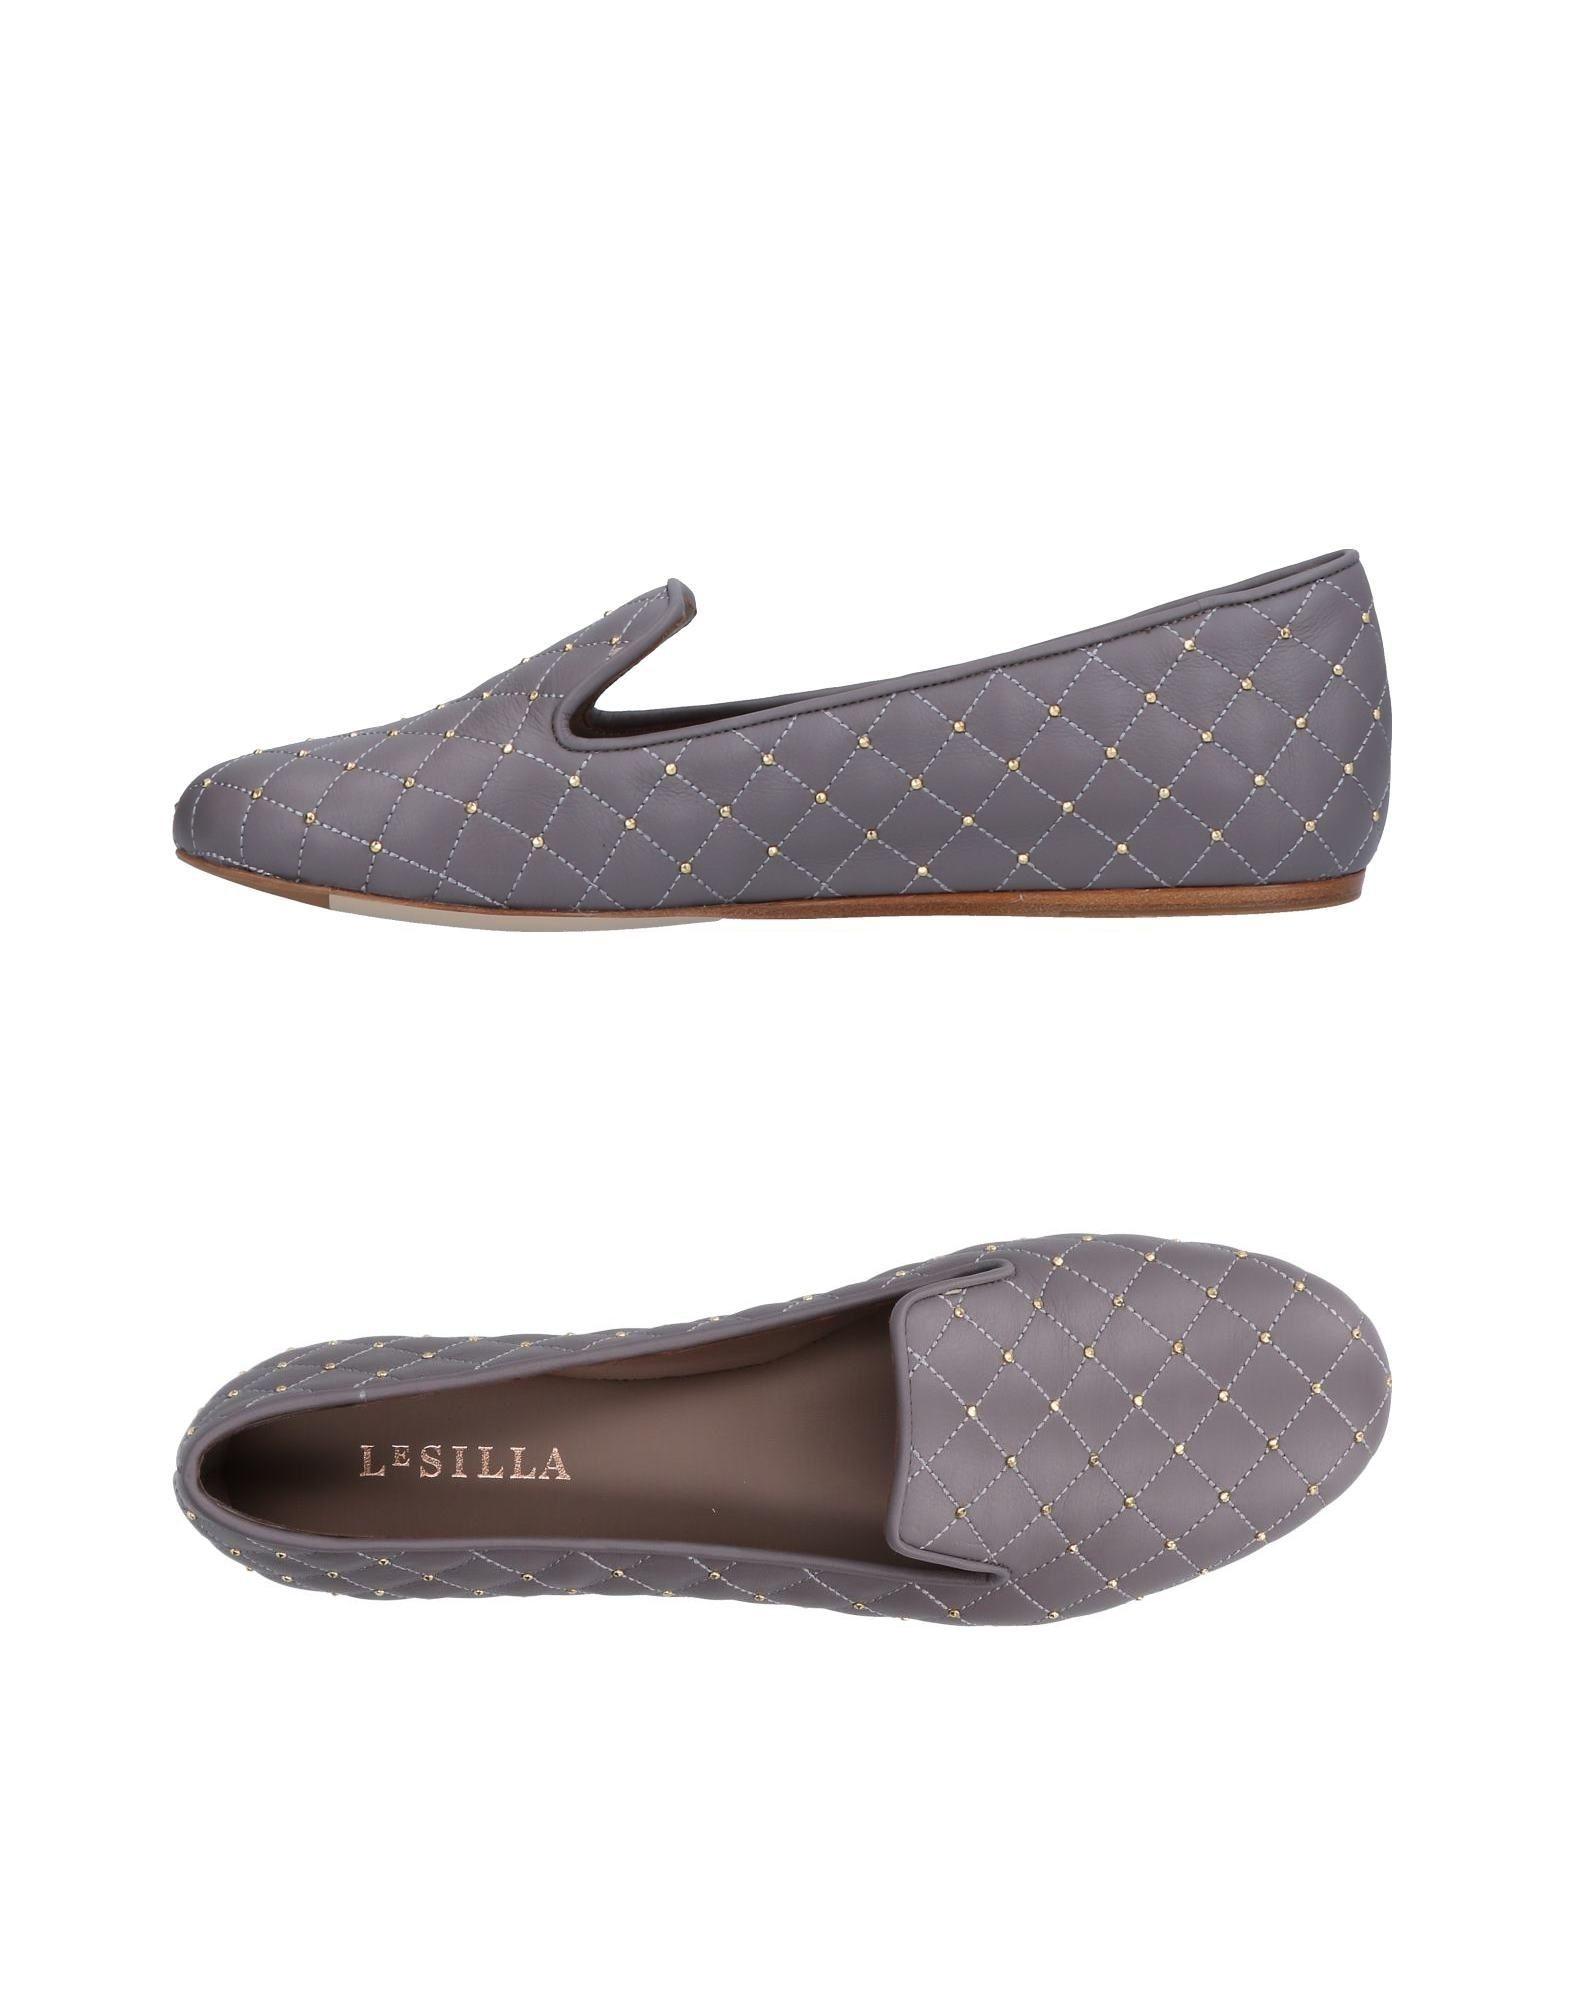 Le Silla Mokassins Damen  11461499OD Beliebte Schuhe